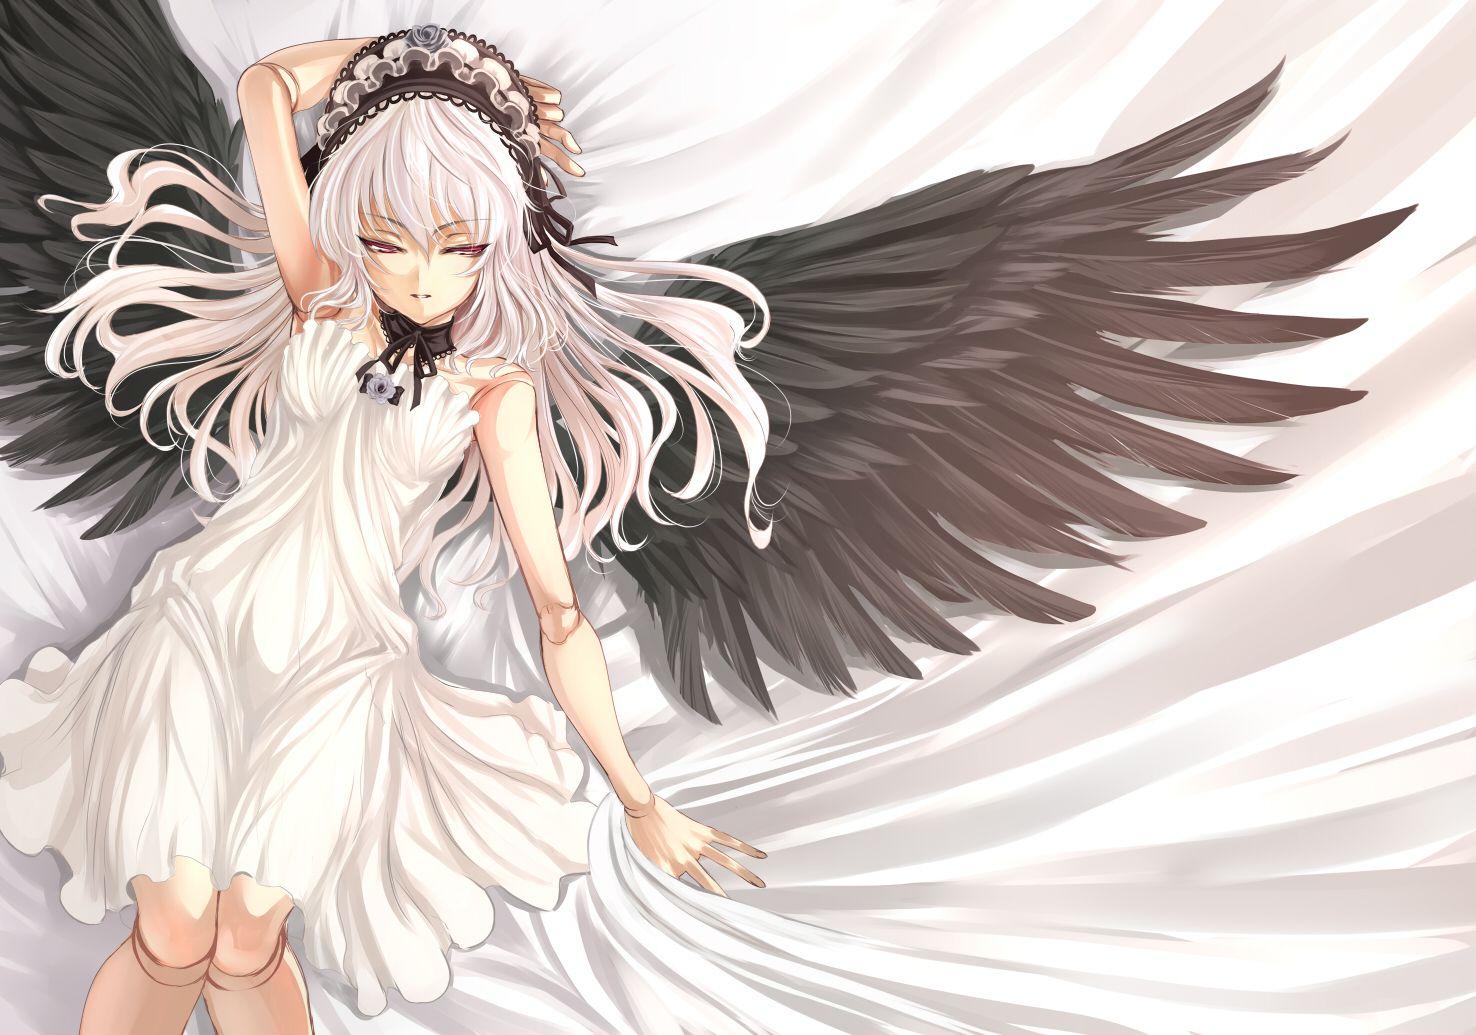 Аниме картинка девушка-ангел